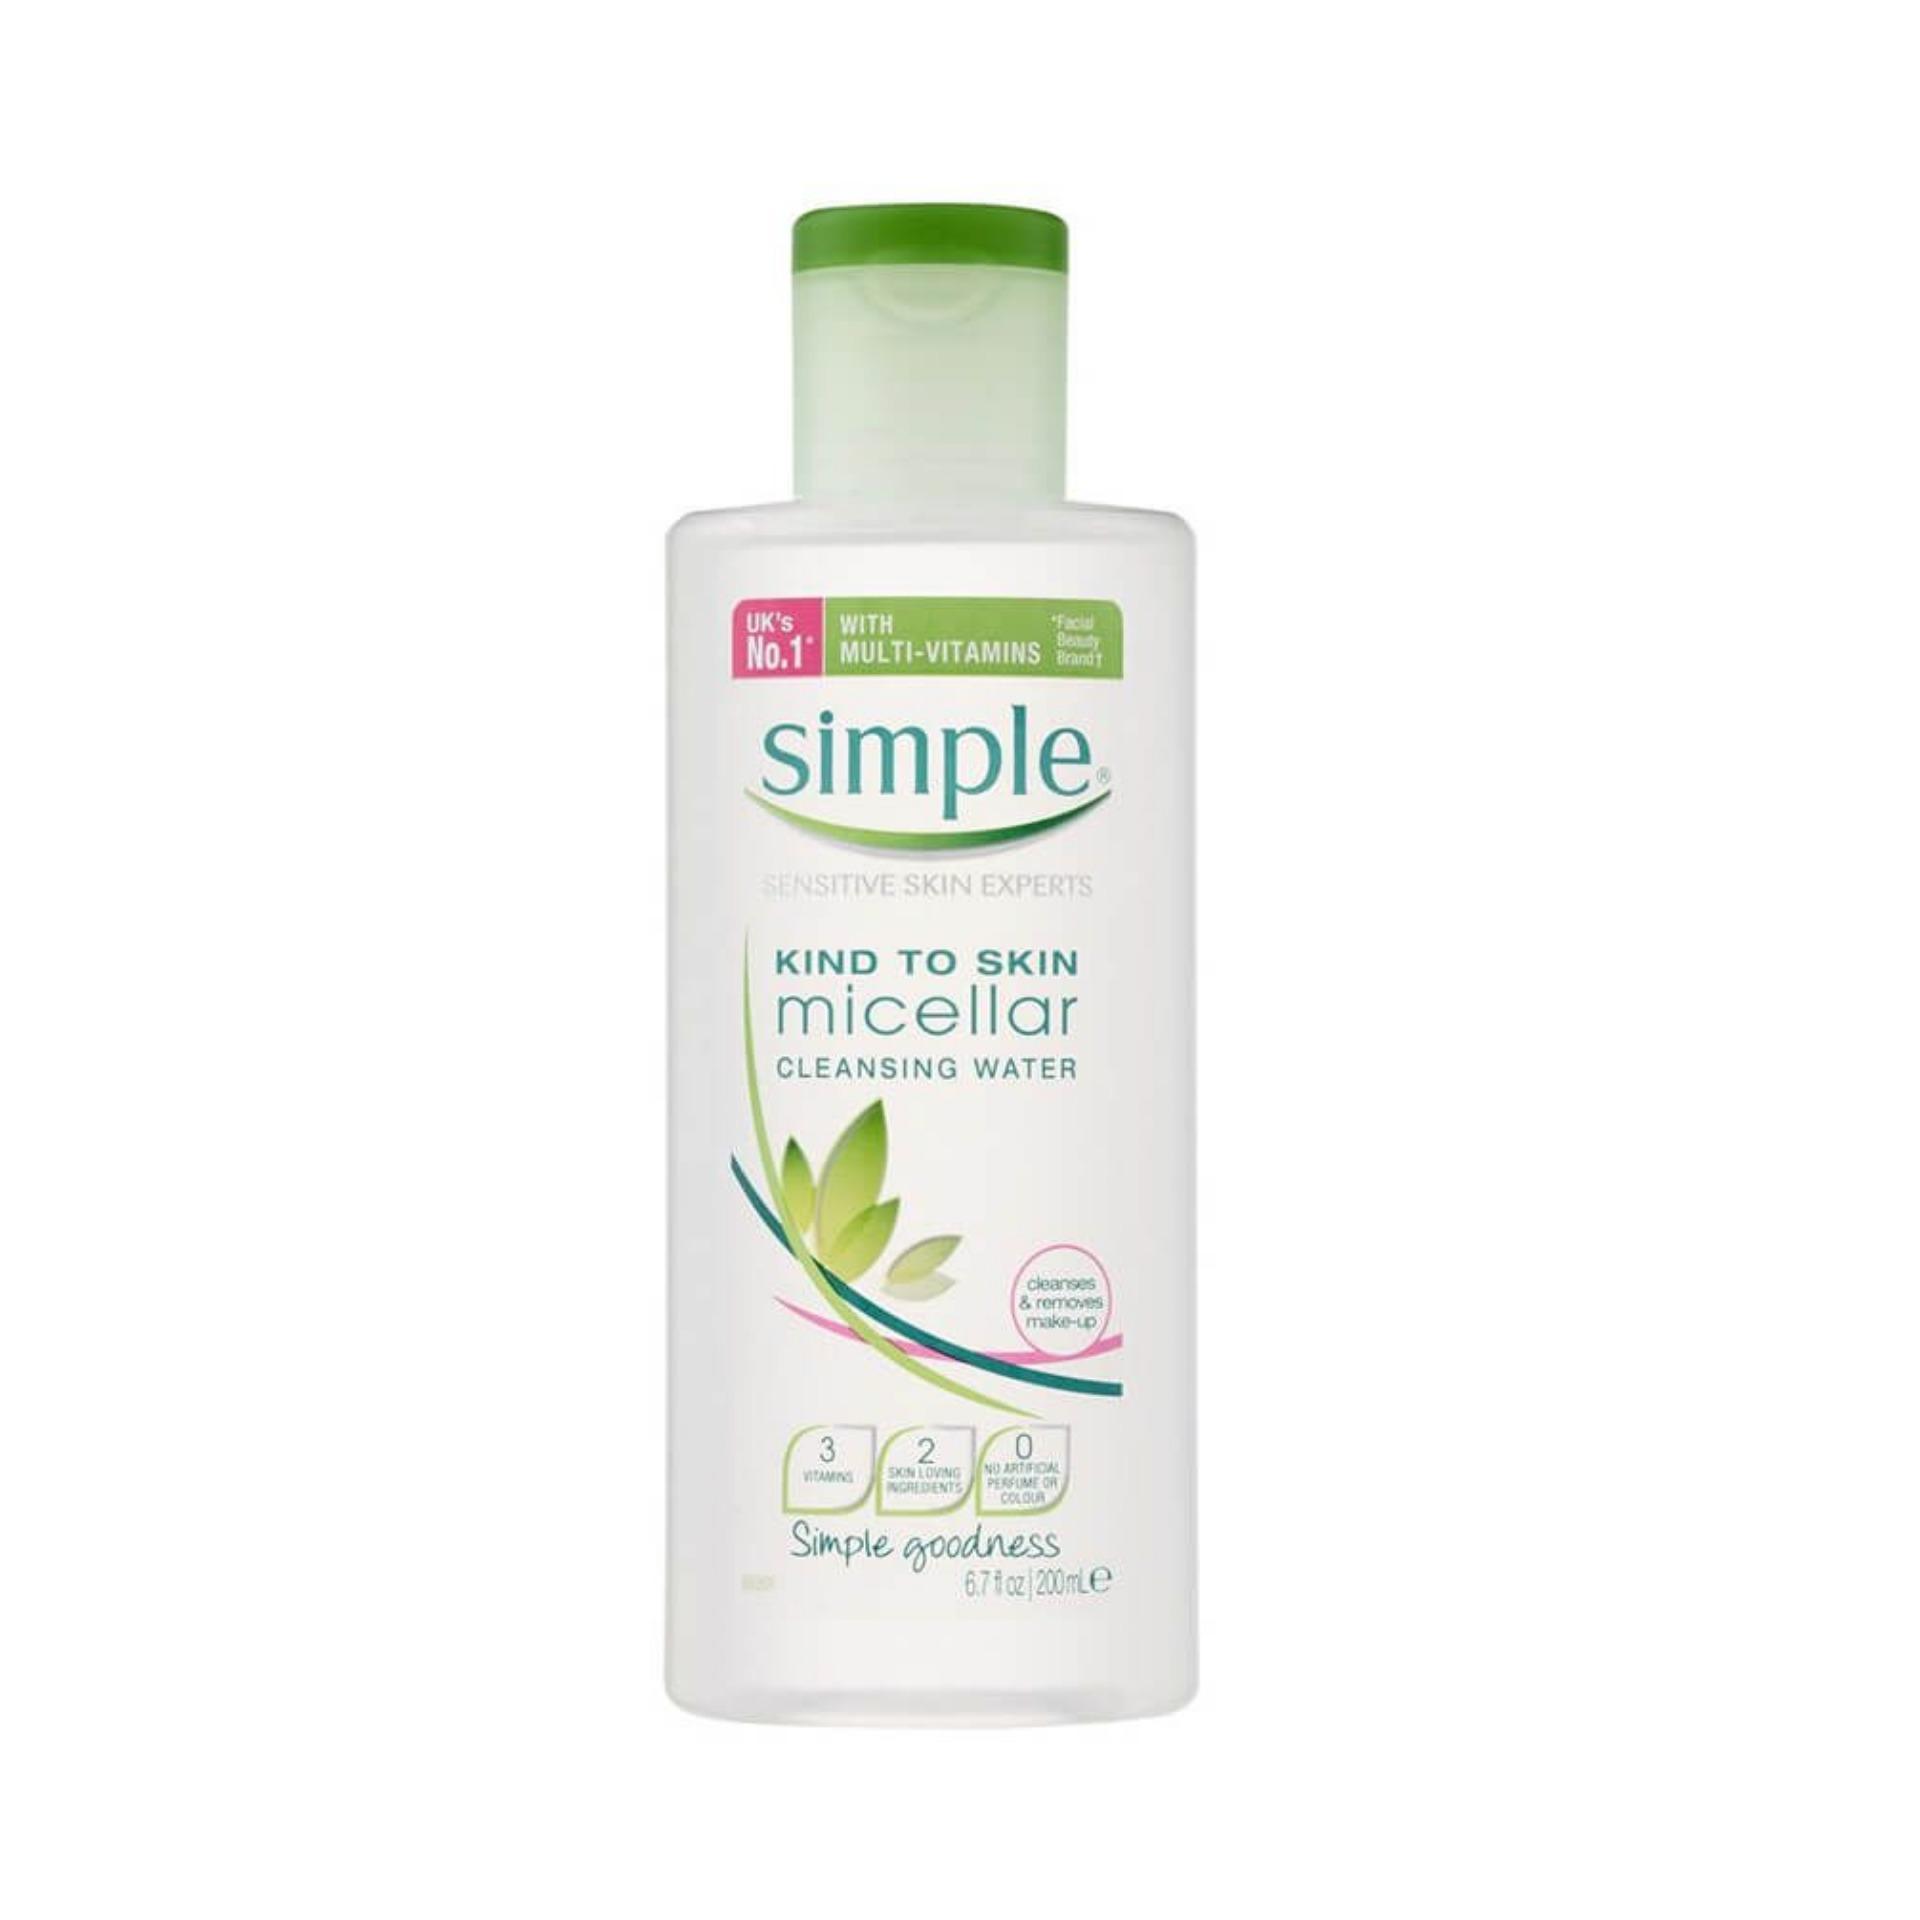 Nước tẩy trang dịu nhẹ Simple Kind To Skin Cleansing Micellar Water 200ml